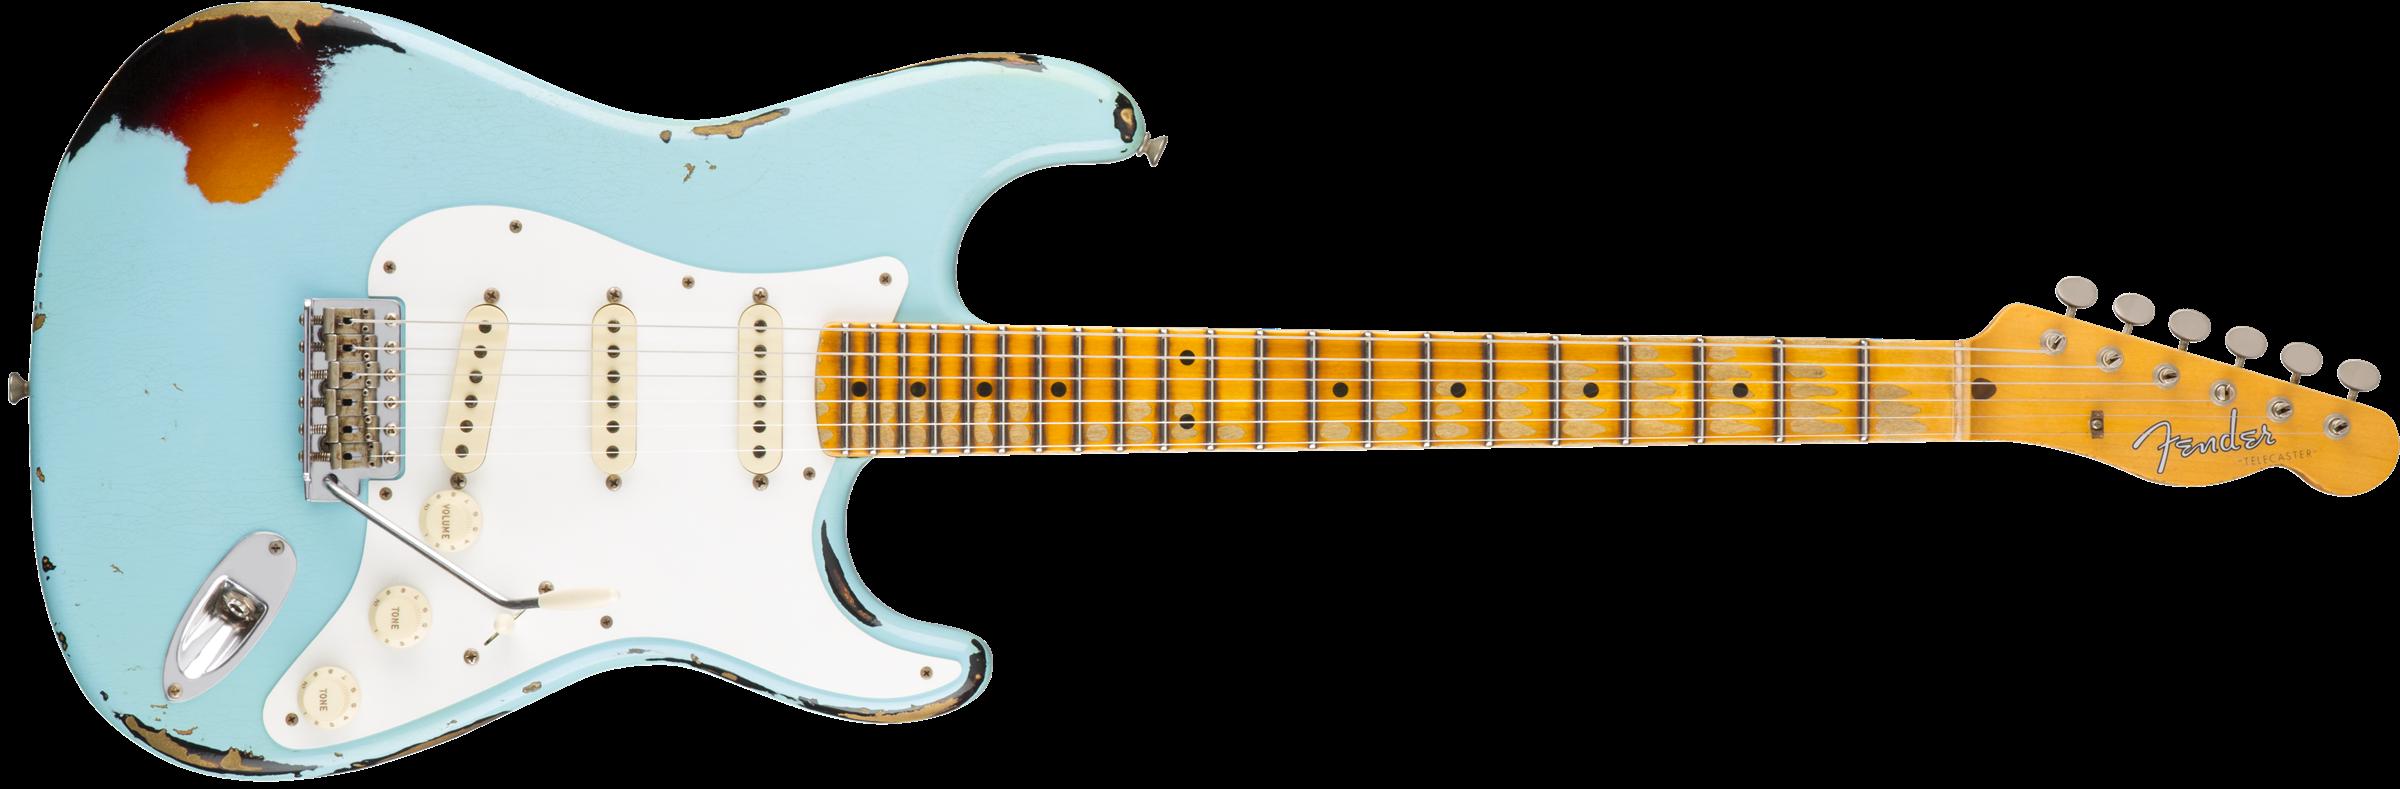 Fender Heavy Relic Mischief Maker - Fender, Transparent background PNG HD thumbnail